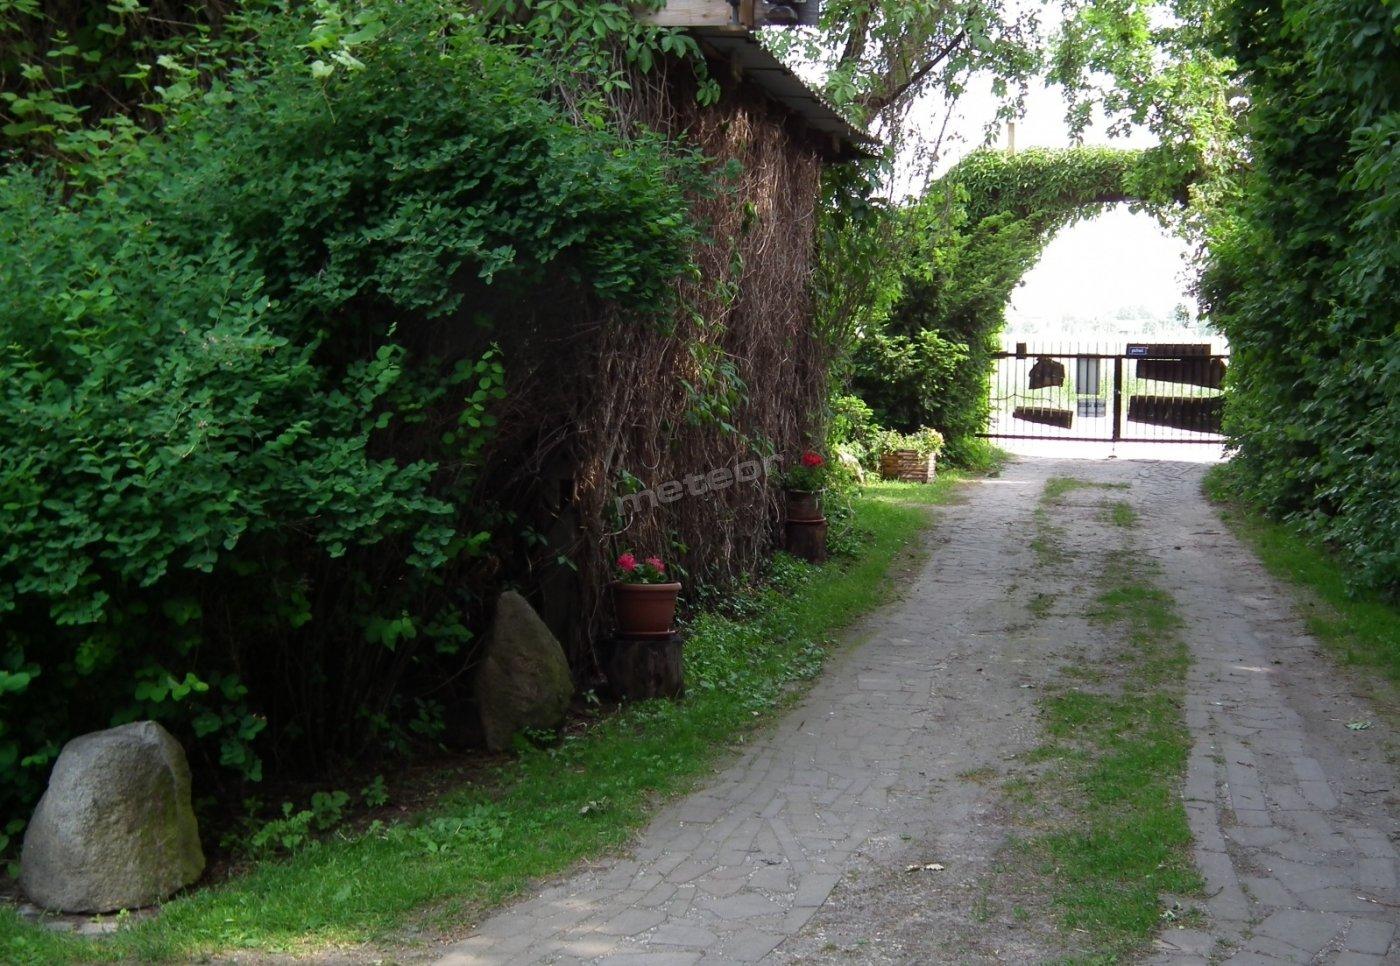 Agroturystyka Chatka pod Brzozą